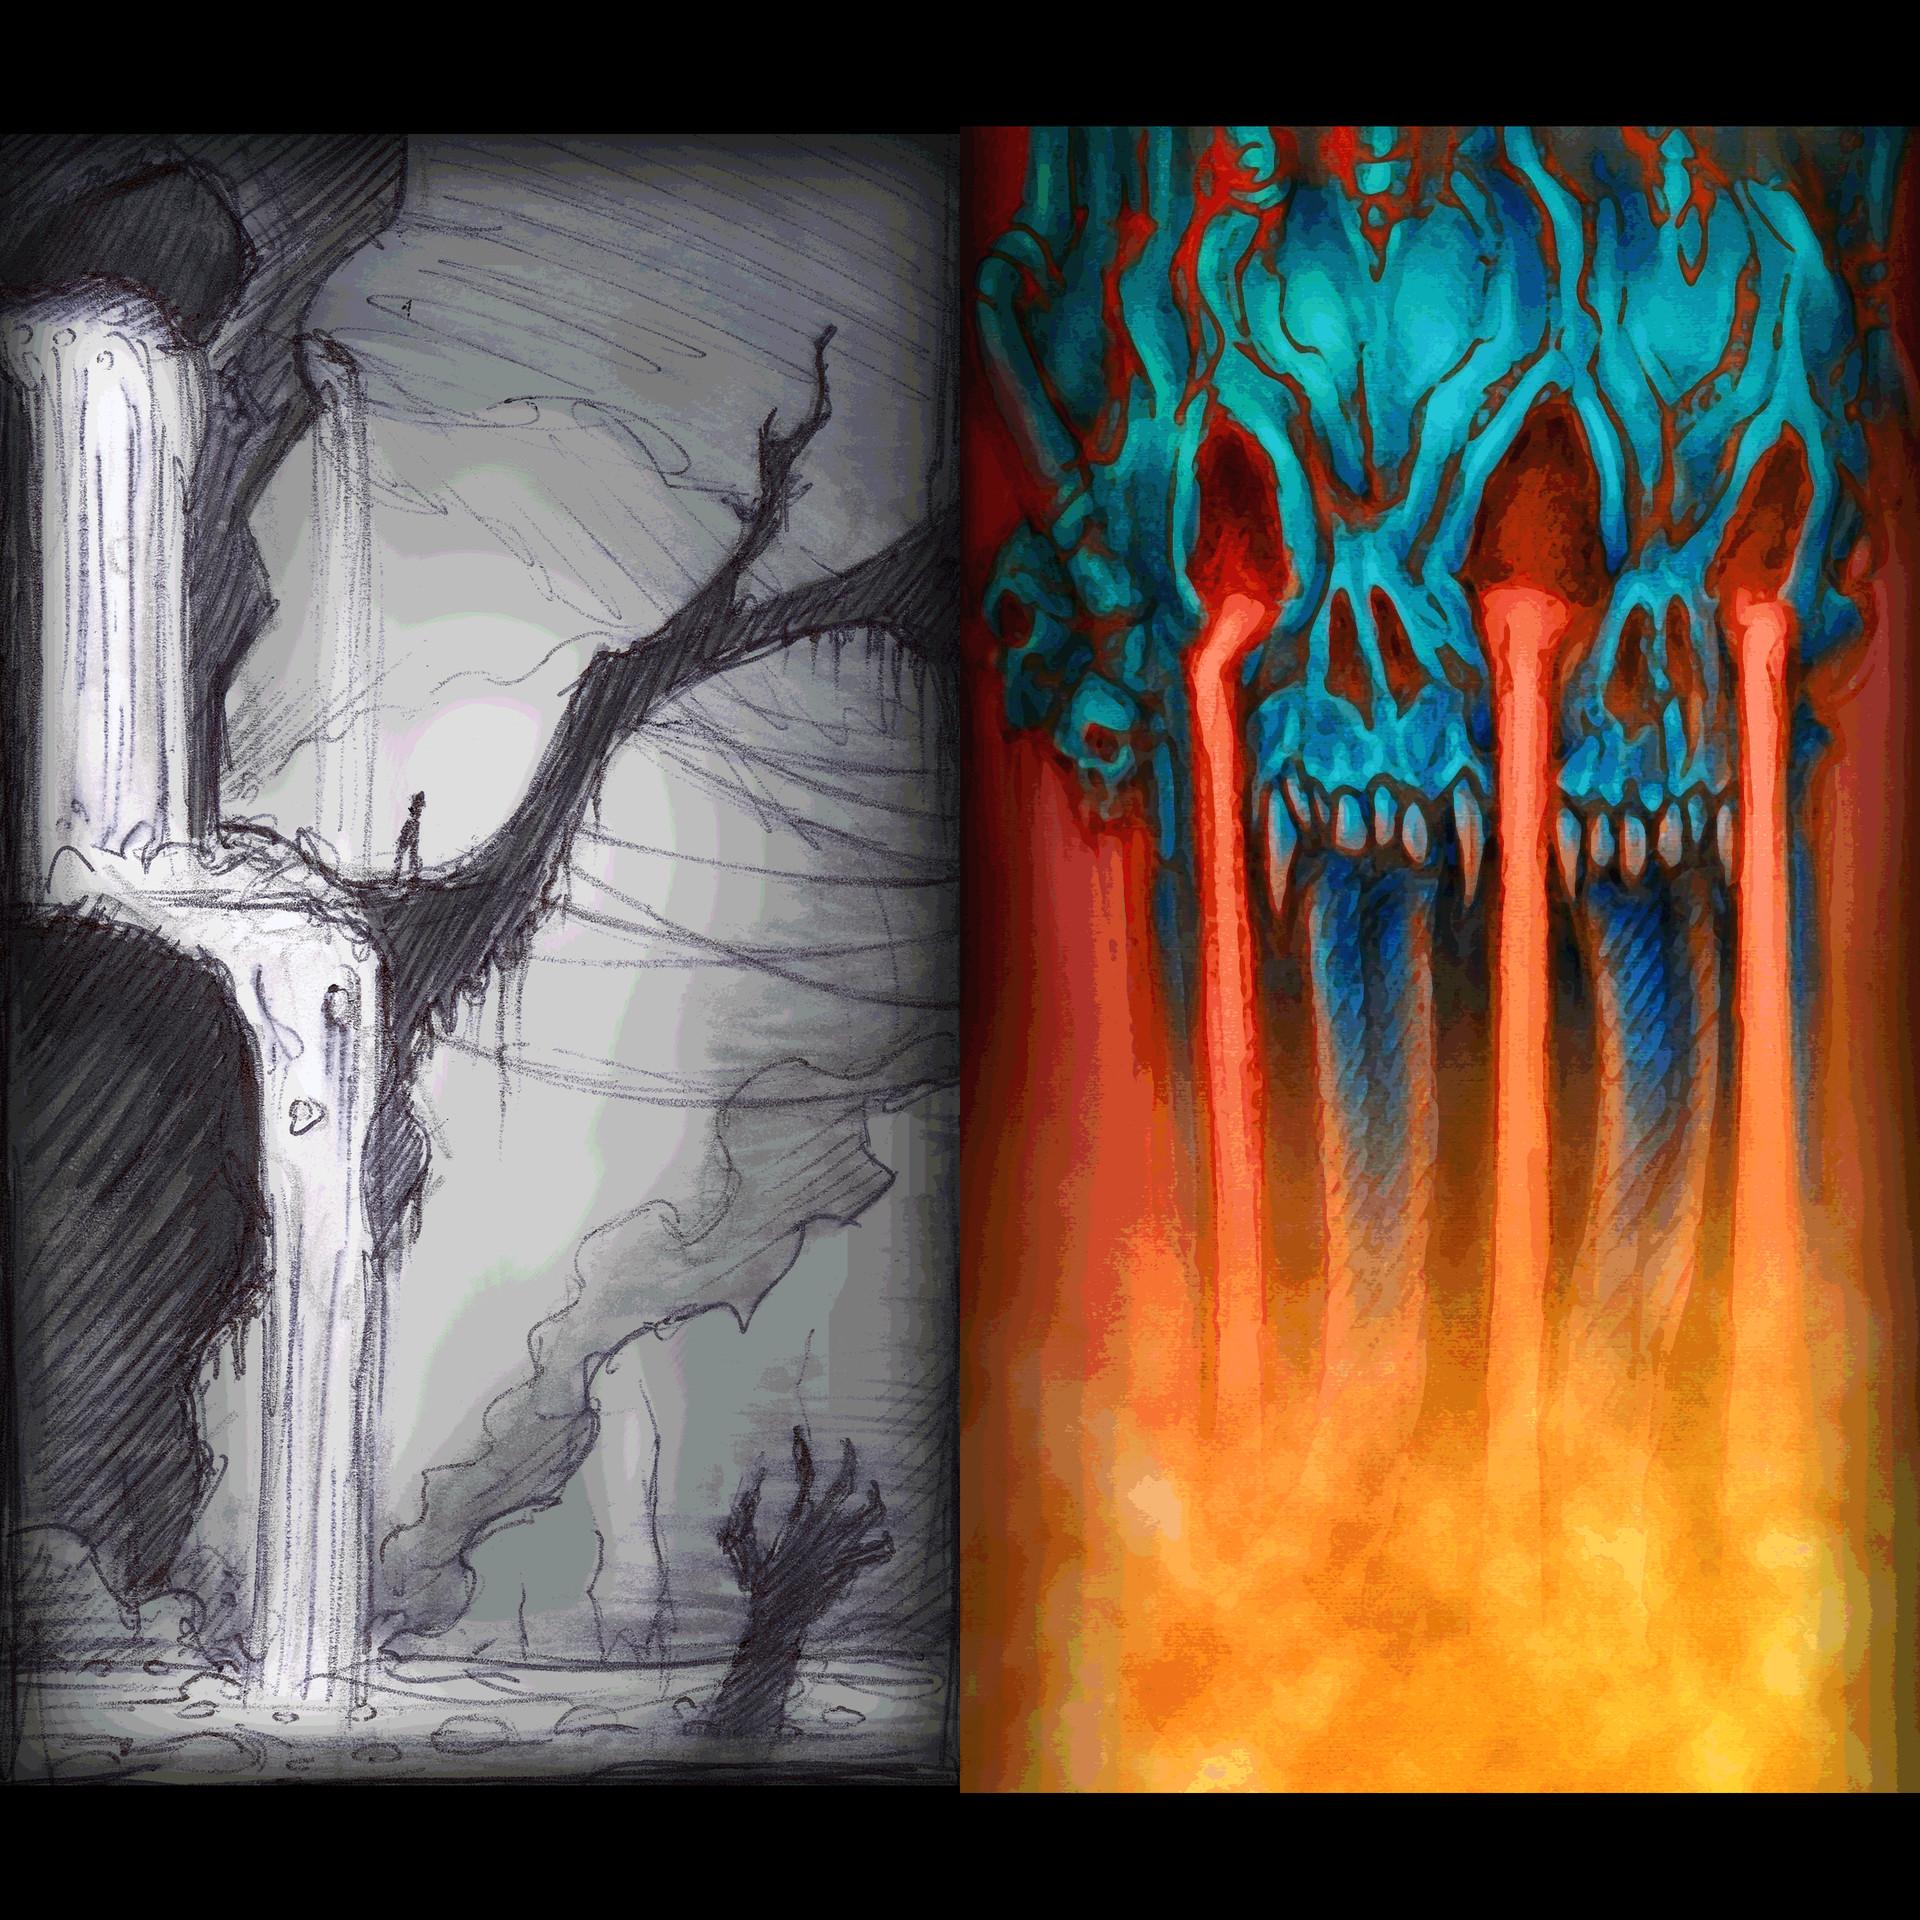 E lynx lin inferno lavafalls00